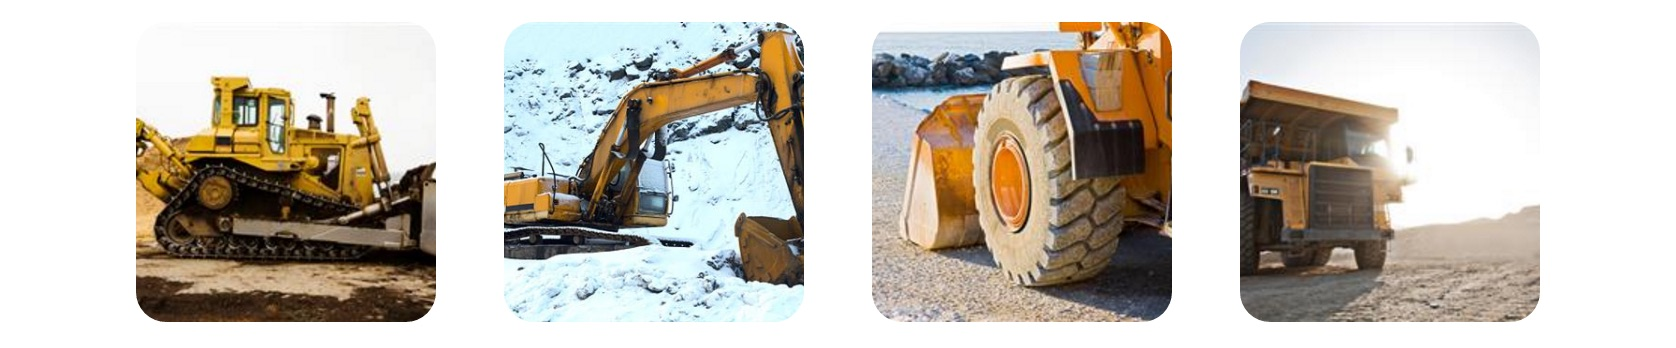 equipment-auctions.jpg